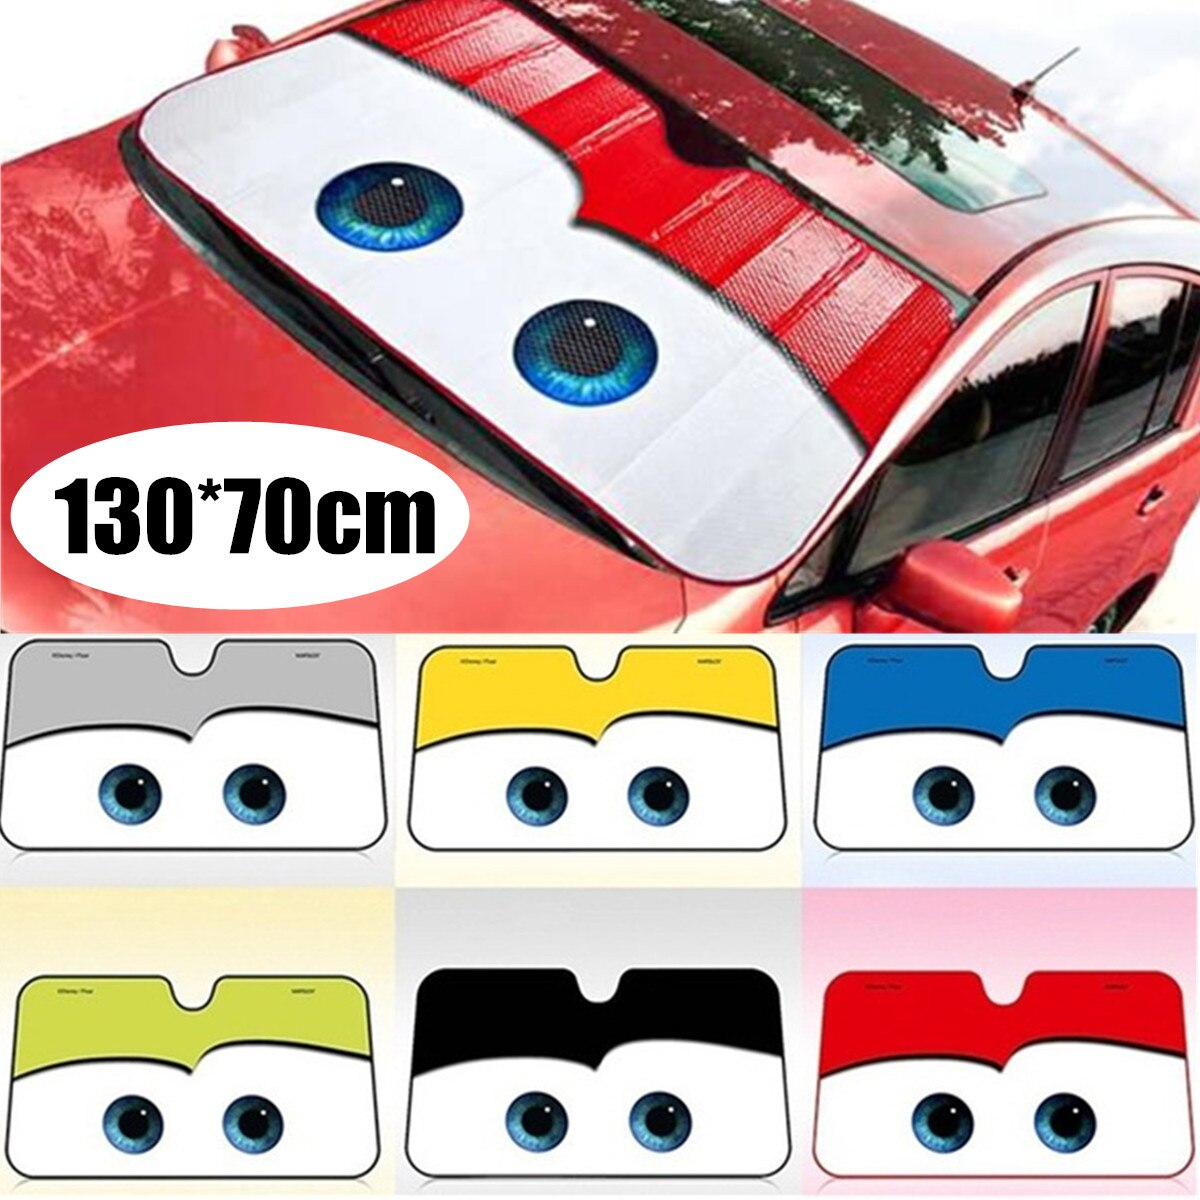 6 Colors Eyes Shape Car Sunshade Heated Windshield Cartoon Windscreen Cover Auto Sun Visor Car-covers Car Solar Protection